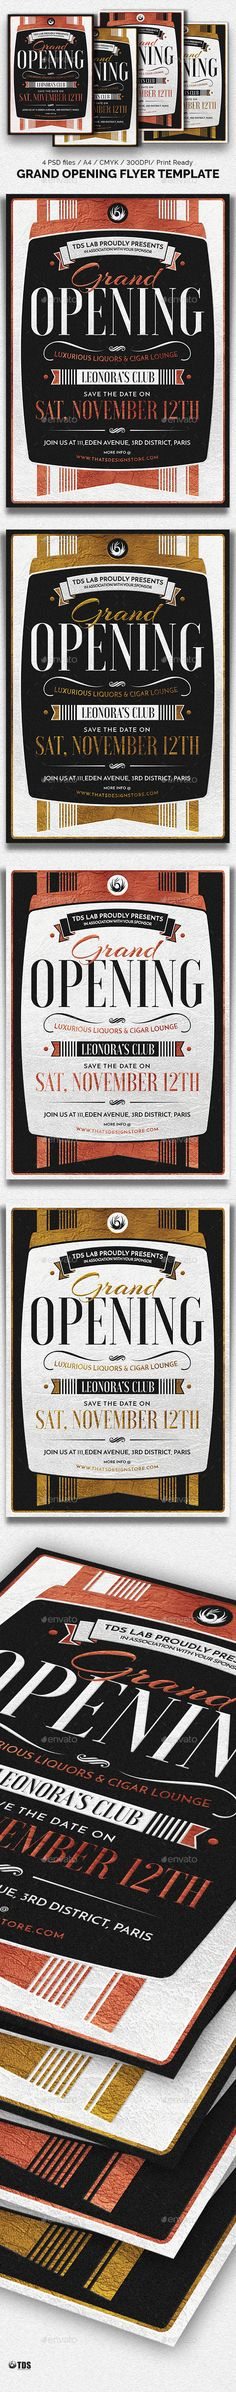 Salon Grand Opening Flyer Template Flyer template, Grand opening - grand opening flyer